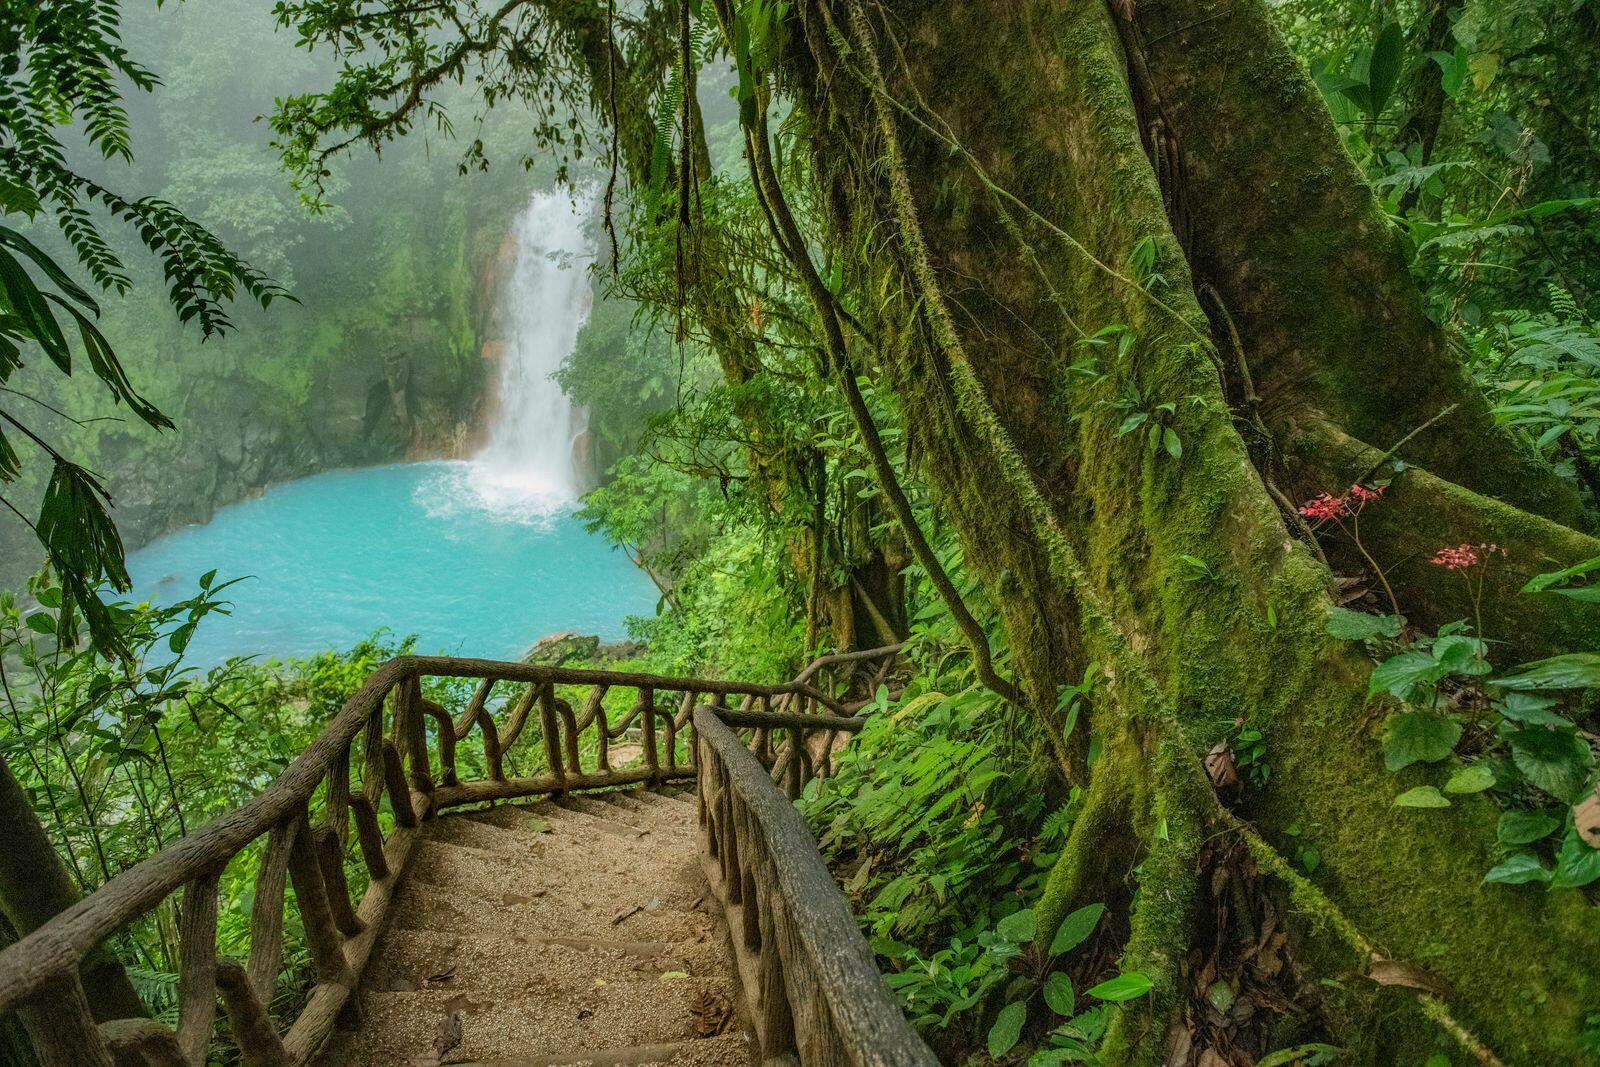 Walway to the Waterfall